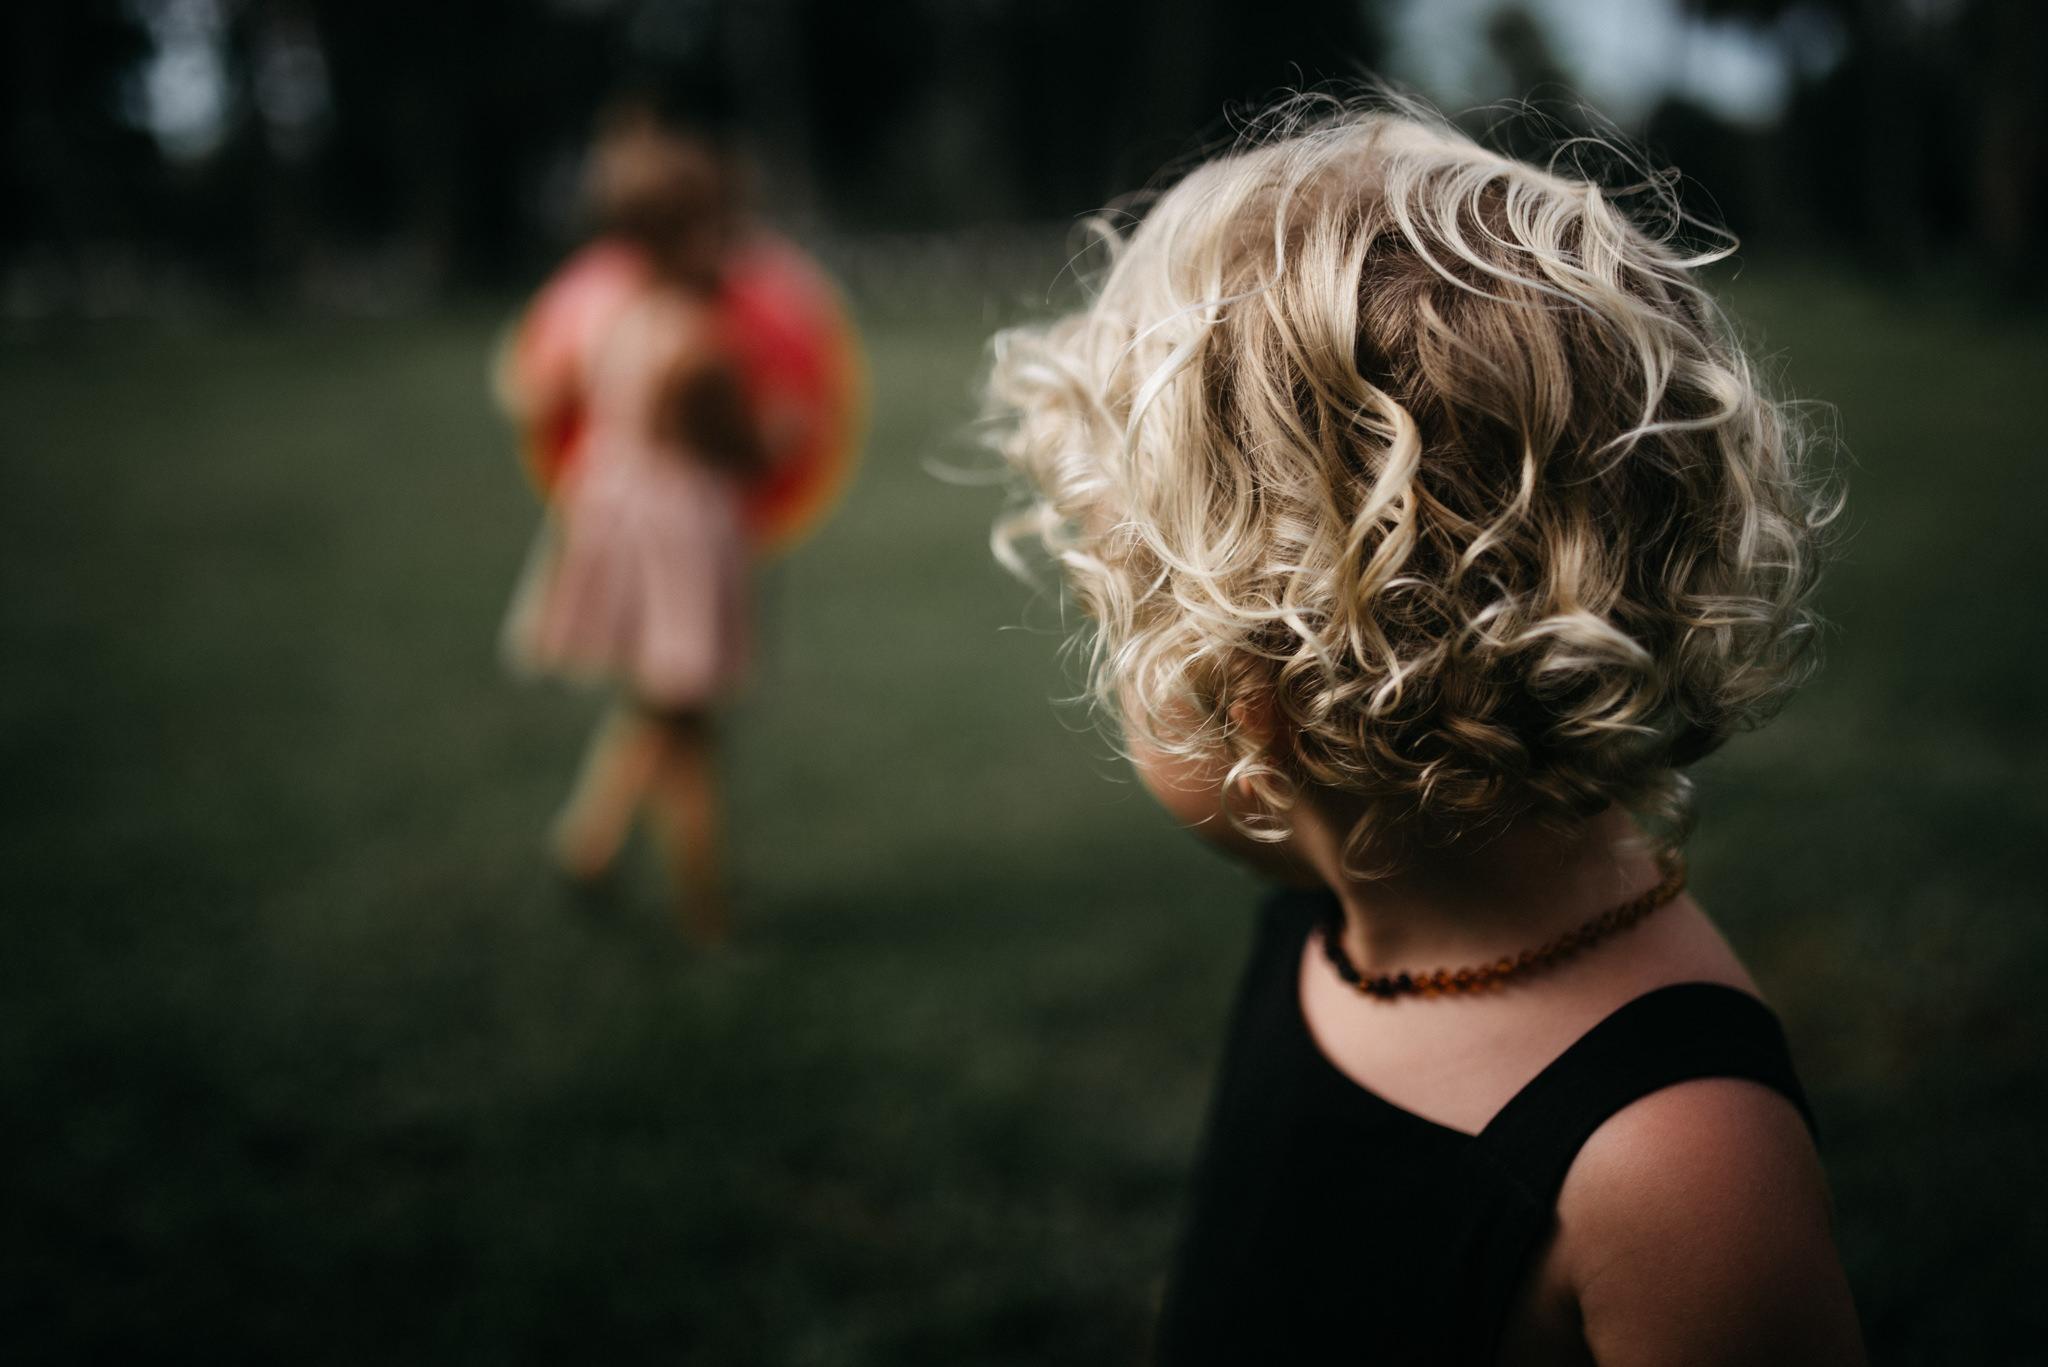 twyla jones photography - treasure coast florida - james vincent design co commercial shoot--3.jpg